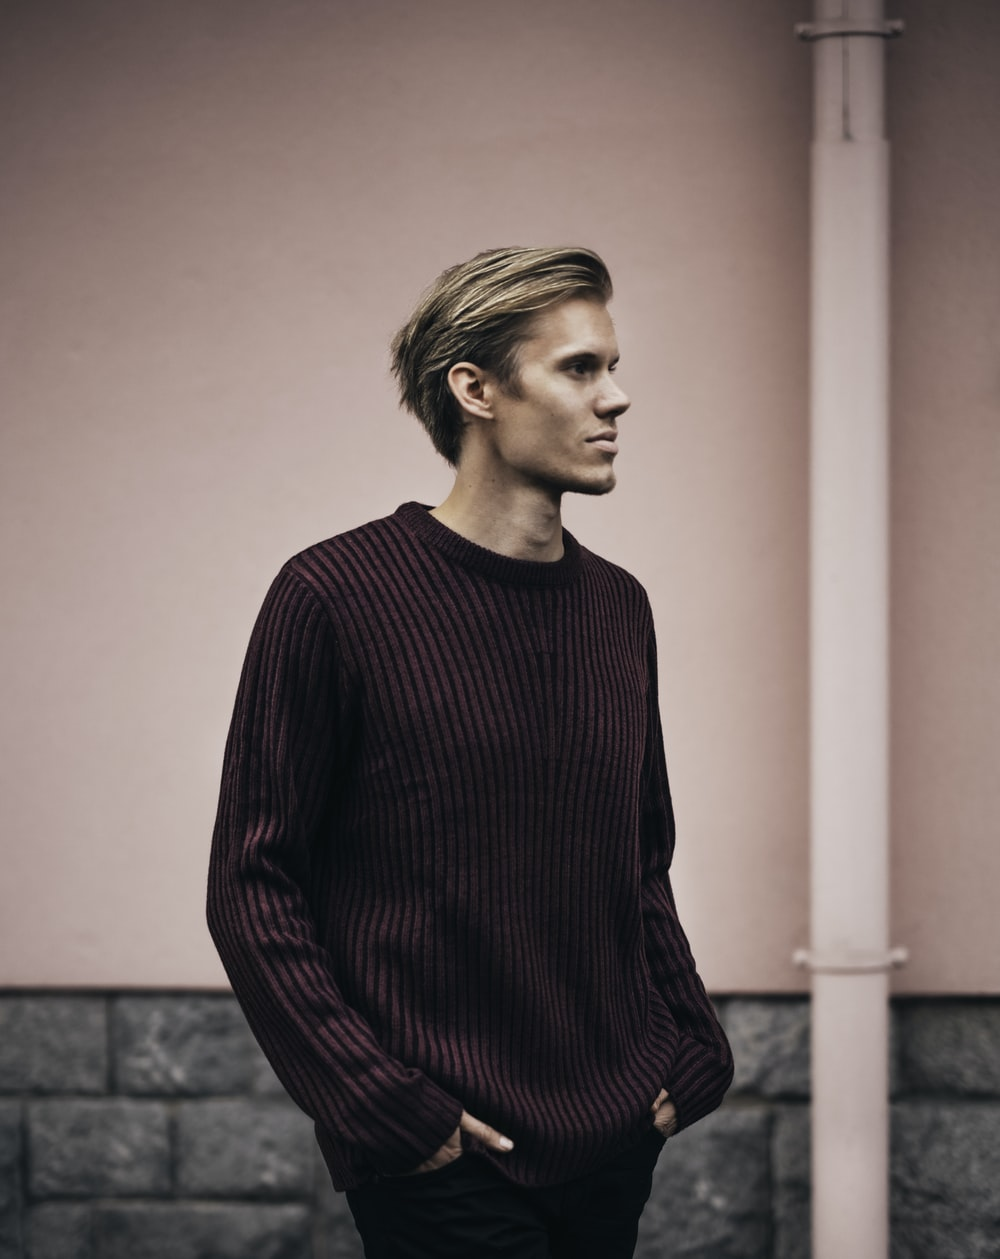 man in brown sweater standing beside wall